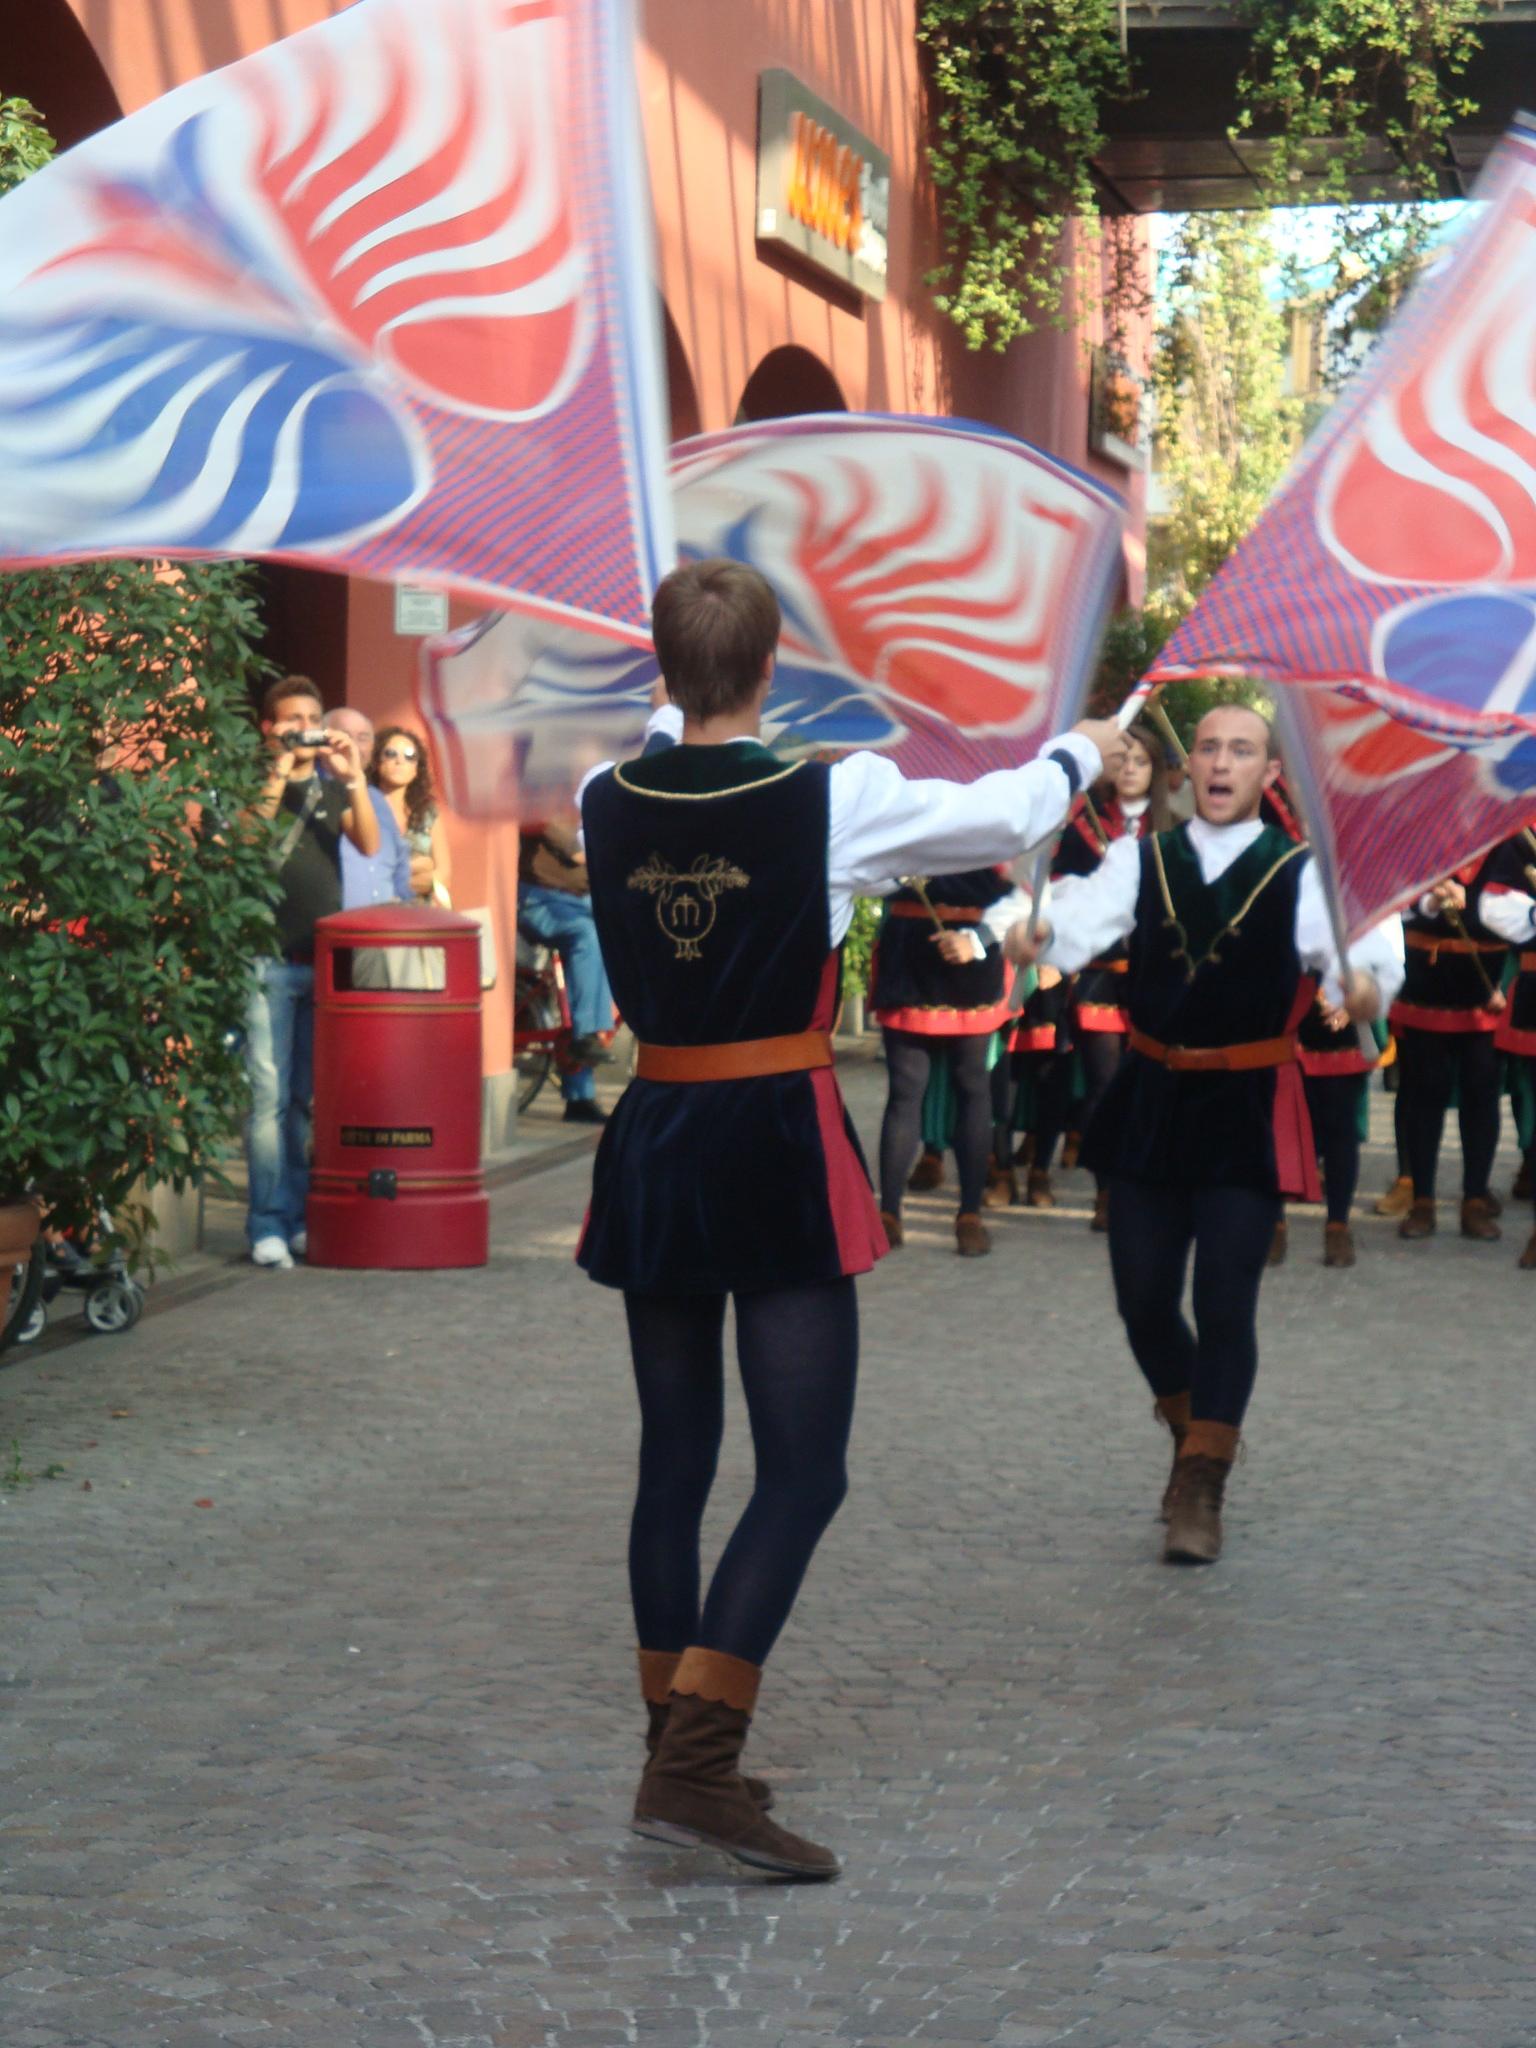 Flag throwers during Renaissance celebration